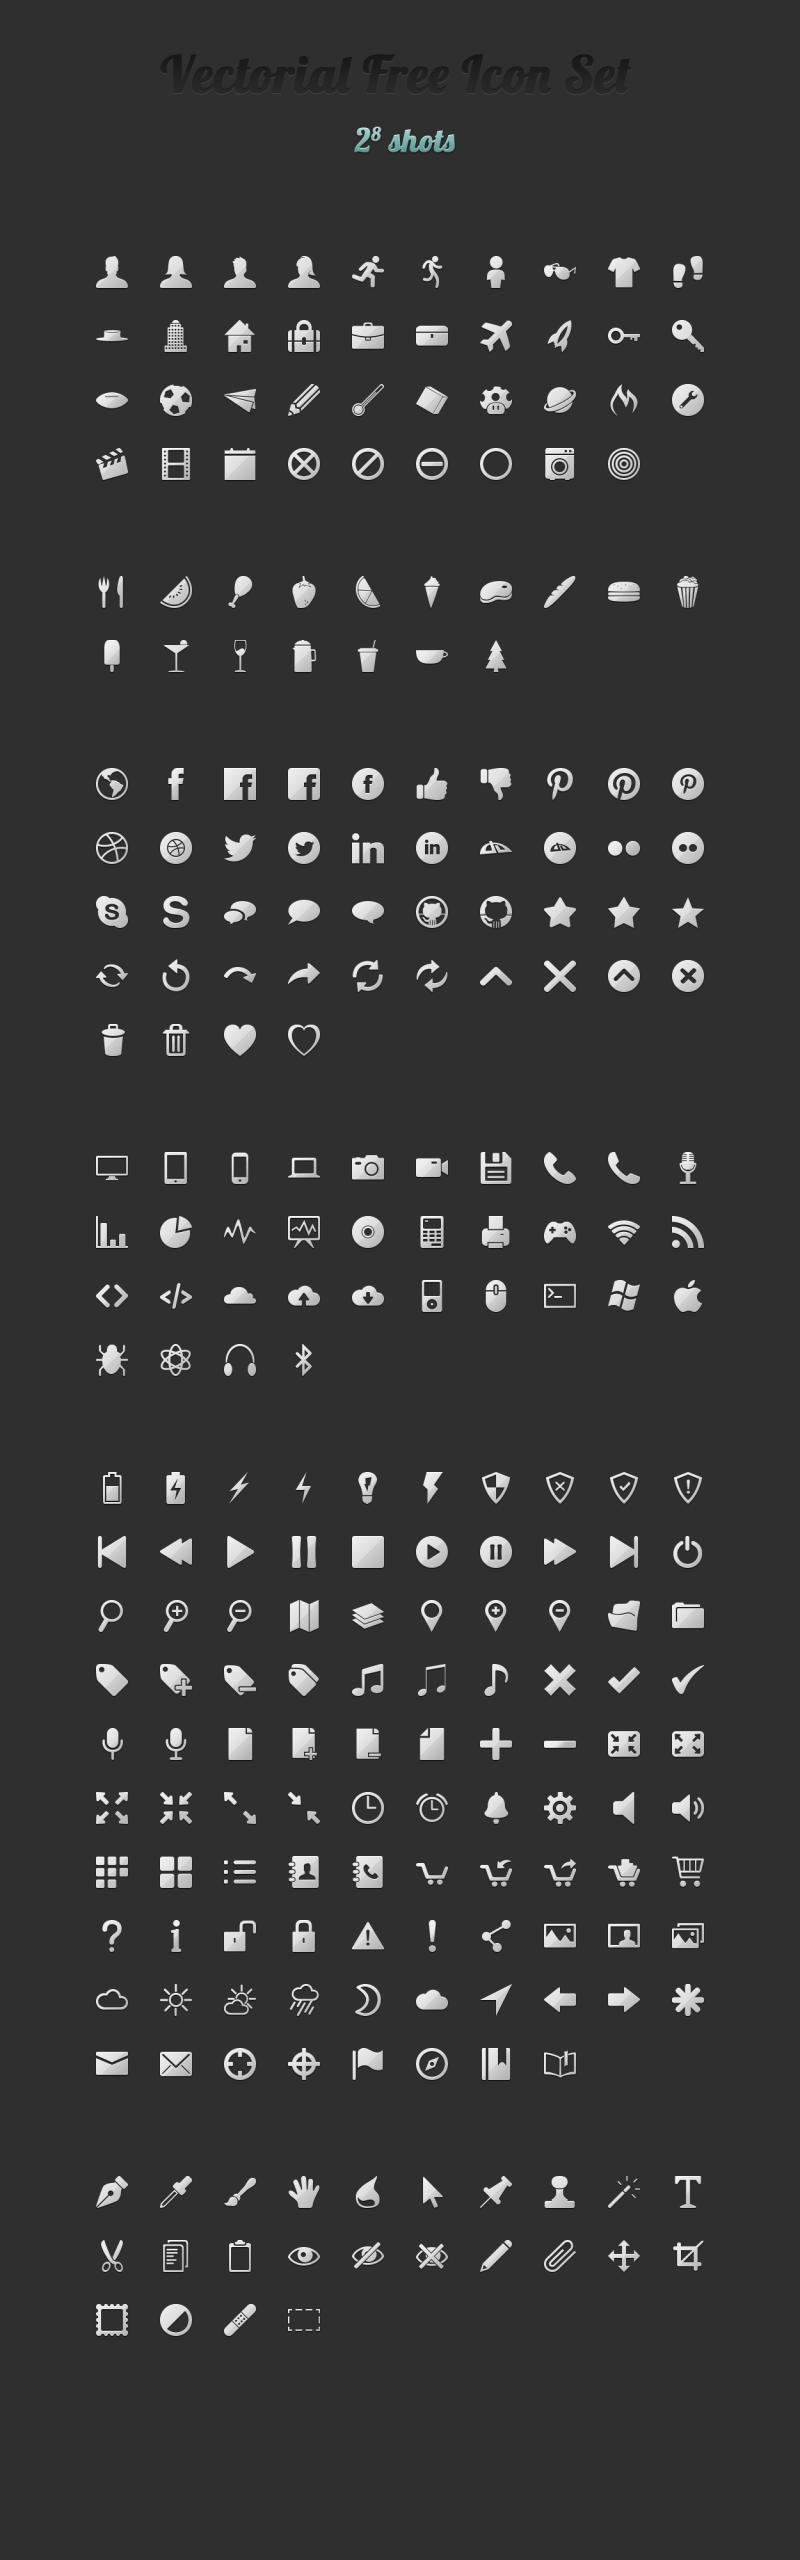 UI图标设计素材